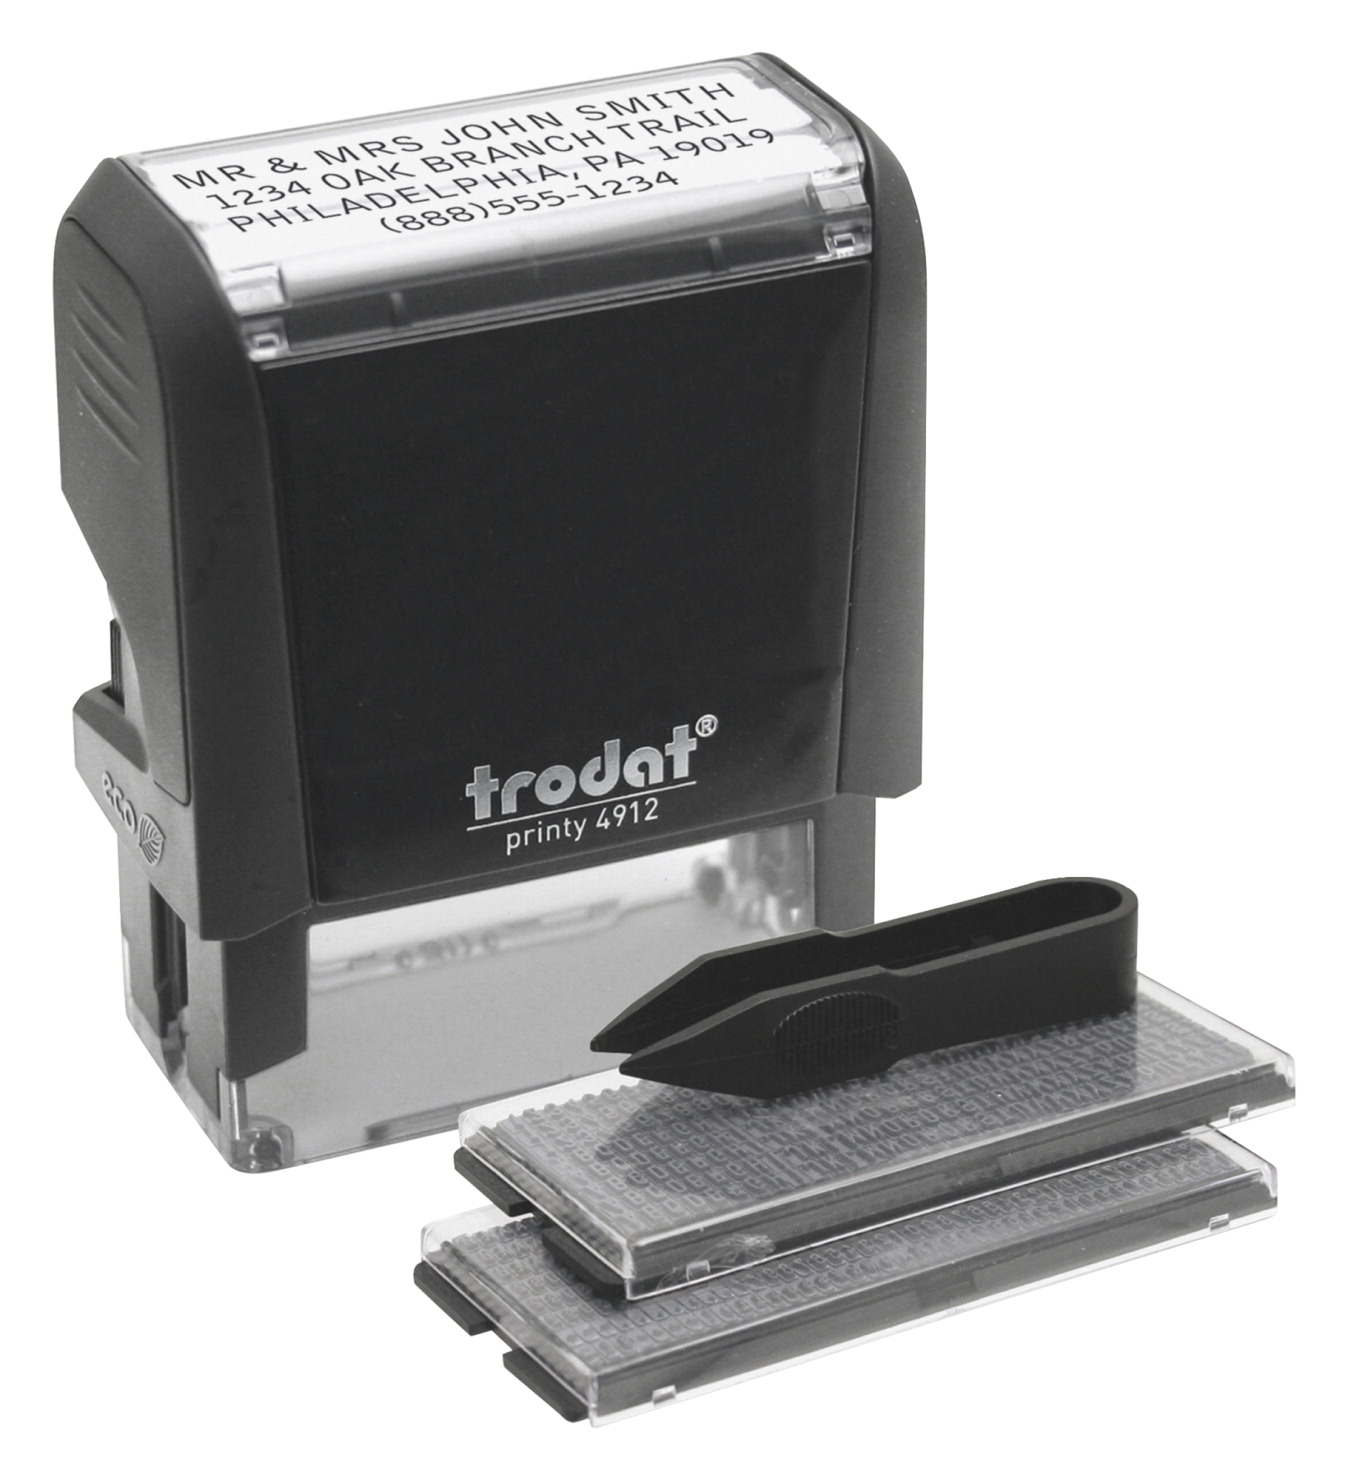 Trodat do it yourself stamp kit black soar life products trodat do it yourself stamp kit 34 x 1 7 solutioingenieria Choice Image